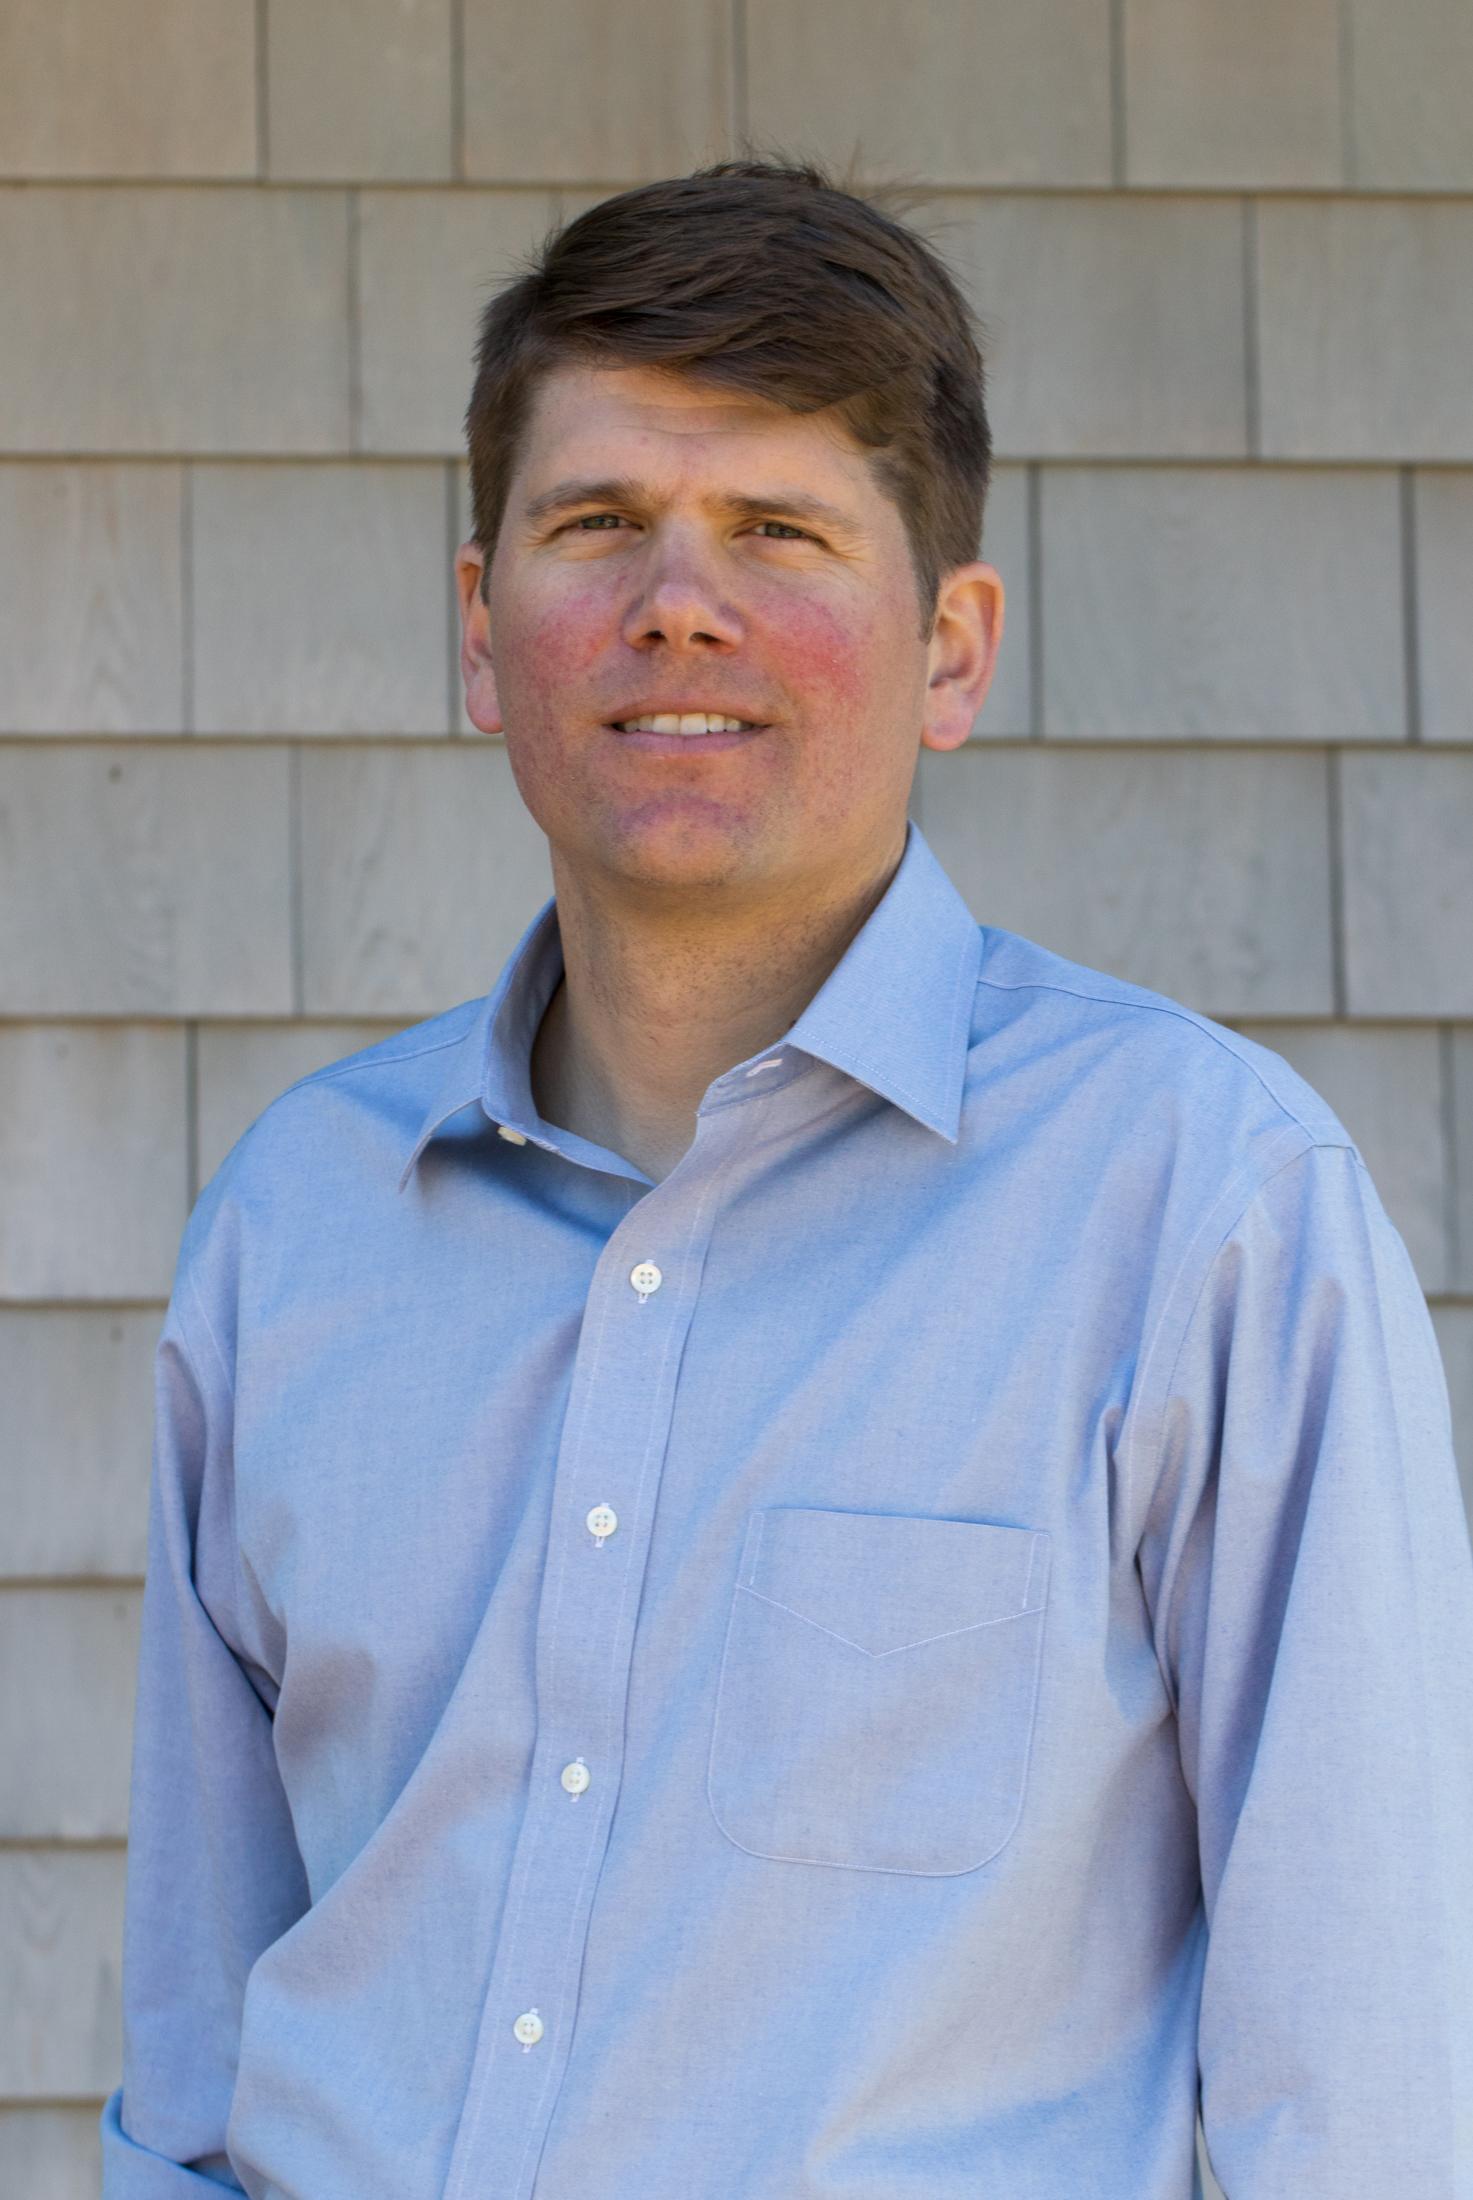 Matt Cole of Cape Associates